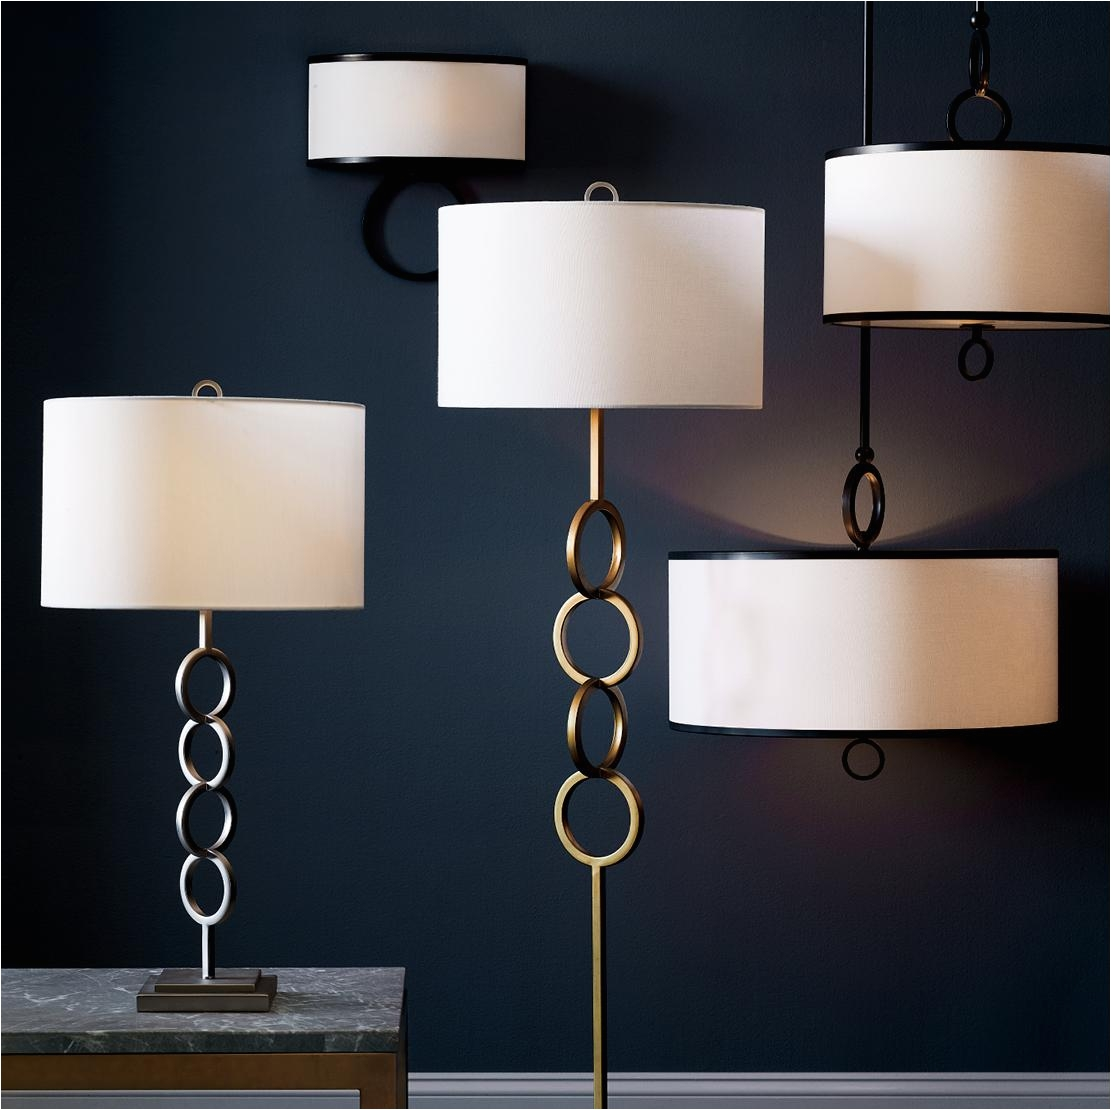 ship lighting fixtures lighting fixtures and home lighting crate and barrel